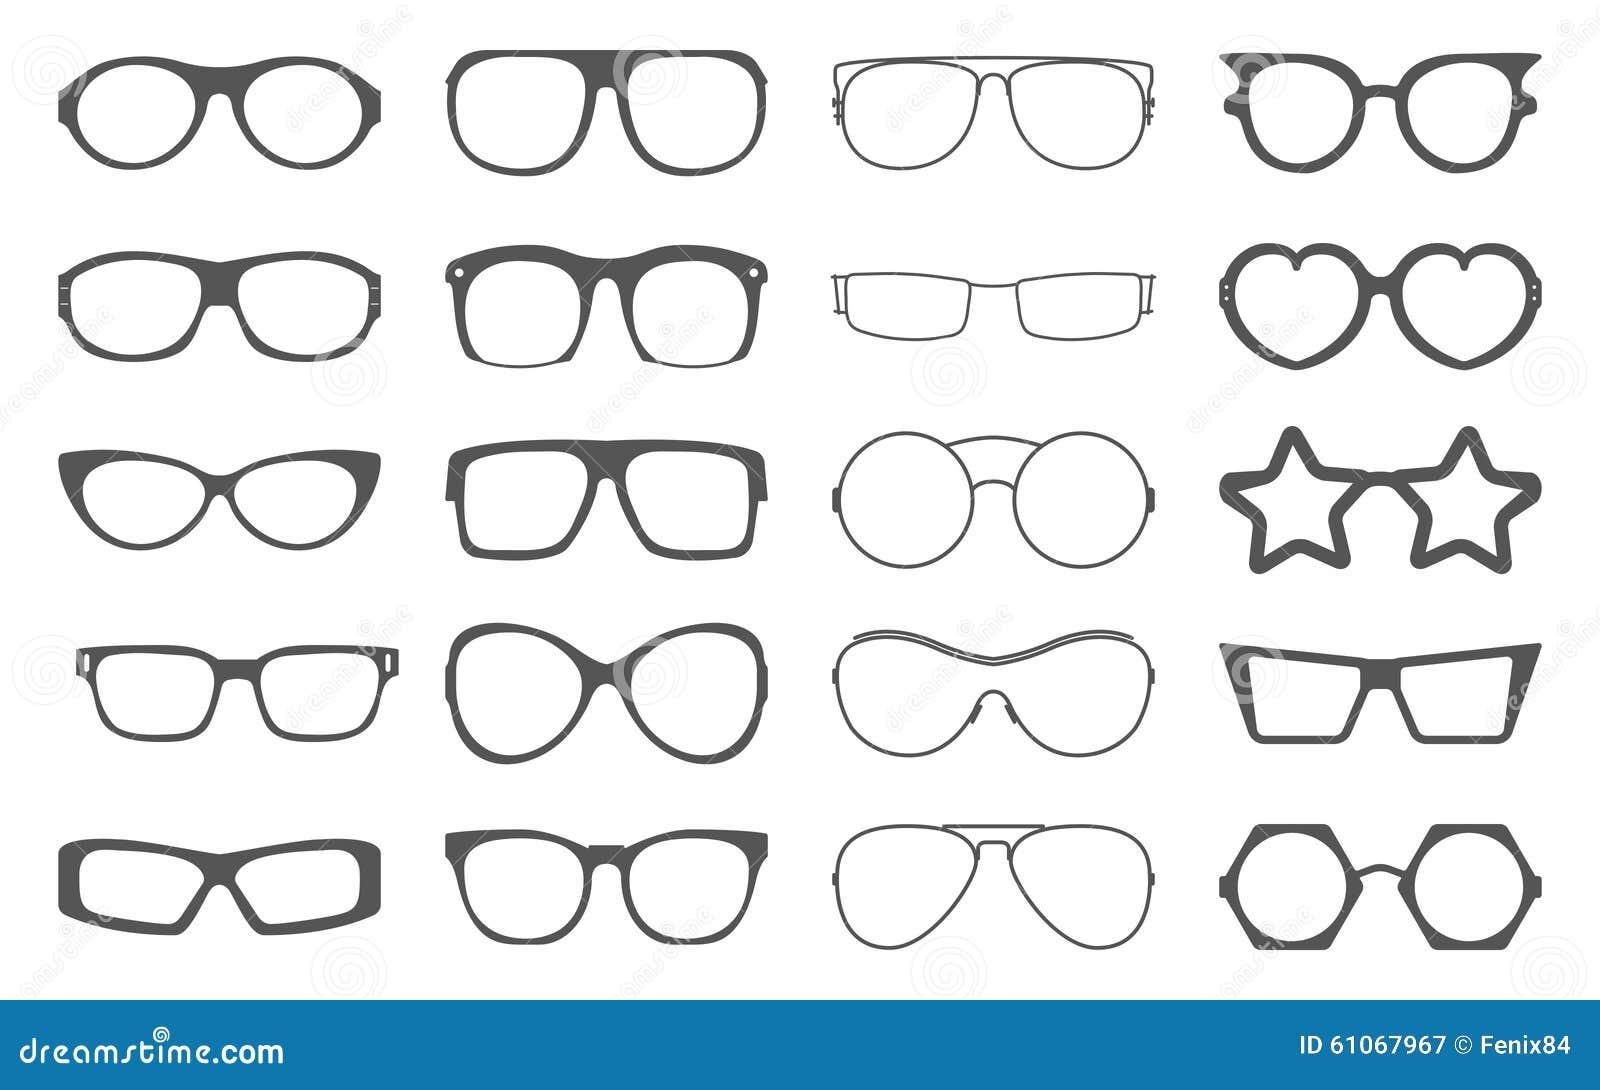 Set Of Sunglasses Frames Isolated On White. Stock Vector ...